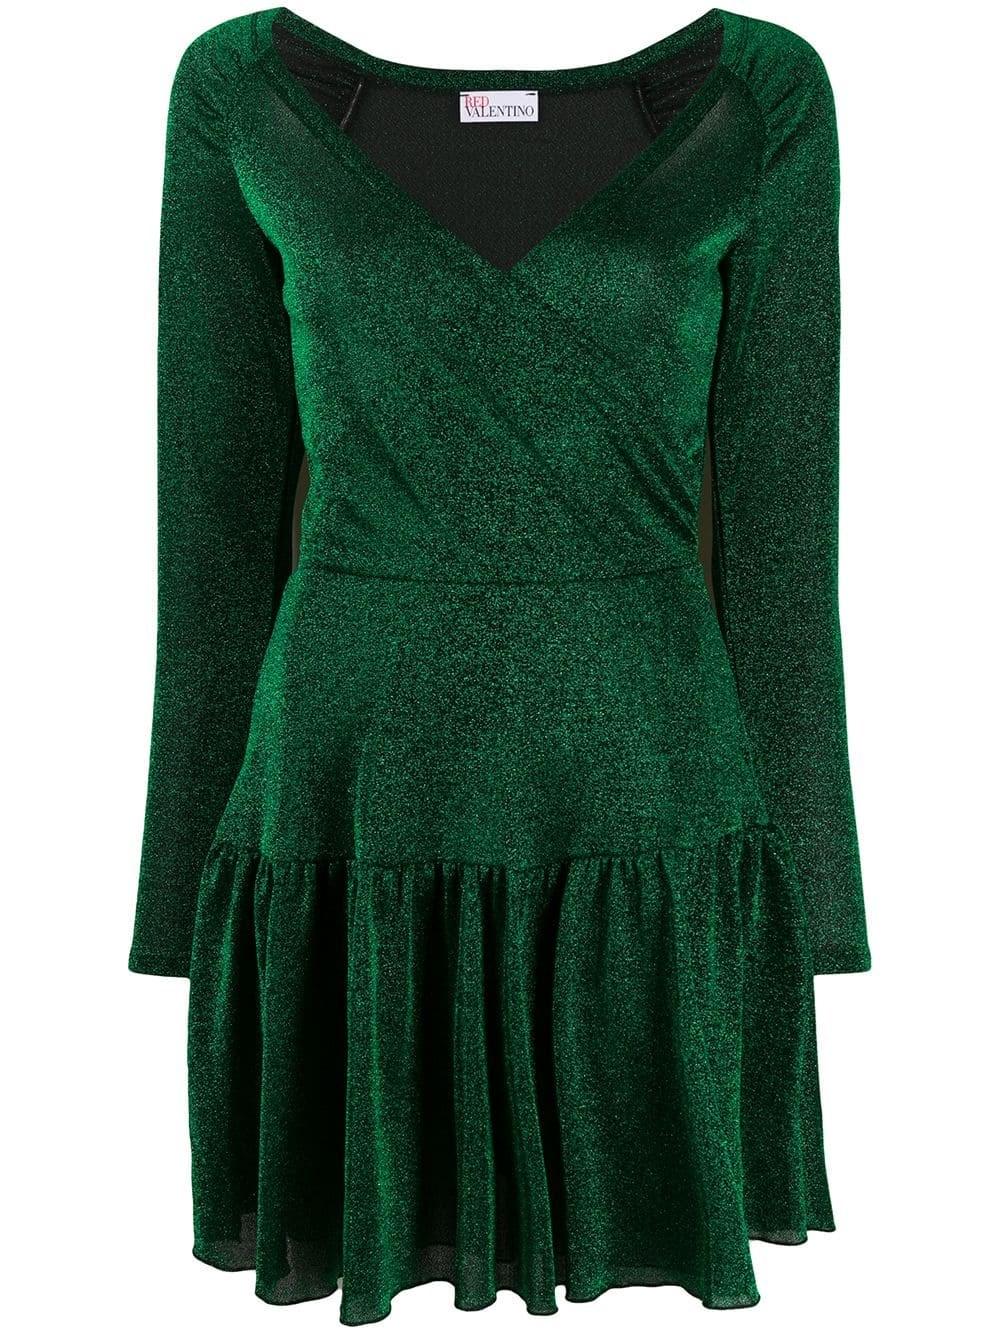 REDVALENTINO Lurex Jersey Mini Dress